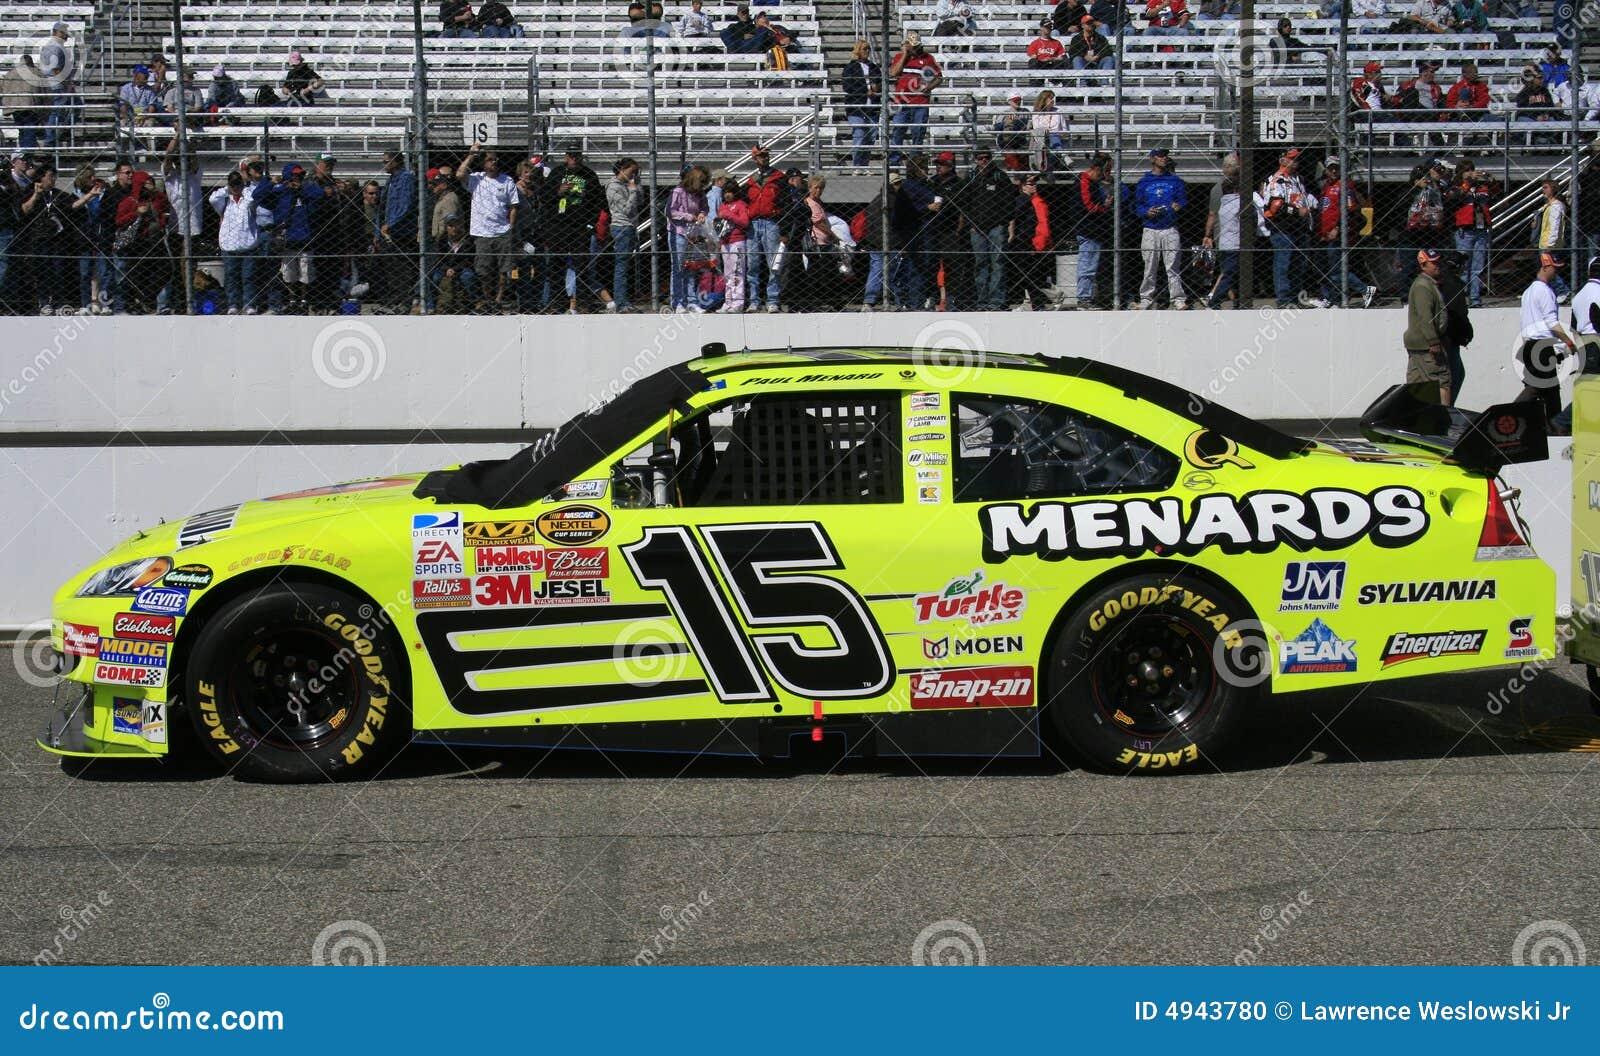 Race Car Number Designs >> NASCAR - Paul Menard's #15 COT Editorial Image - Image: 4943780